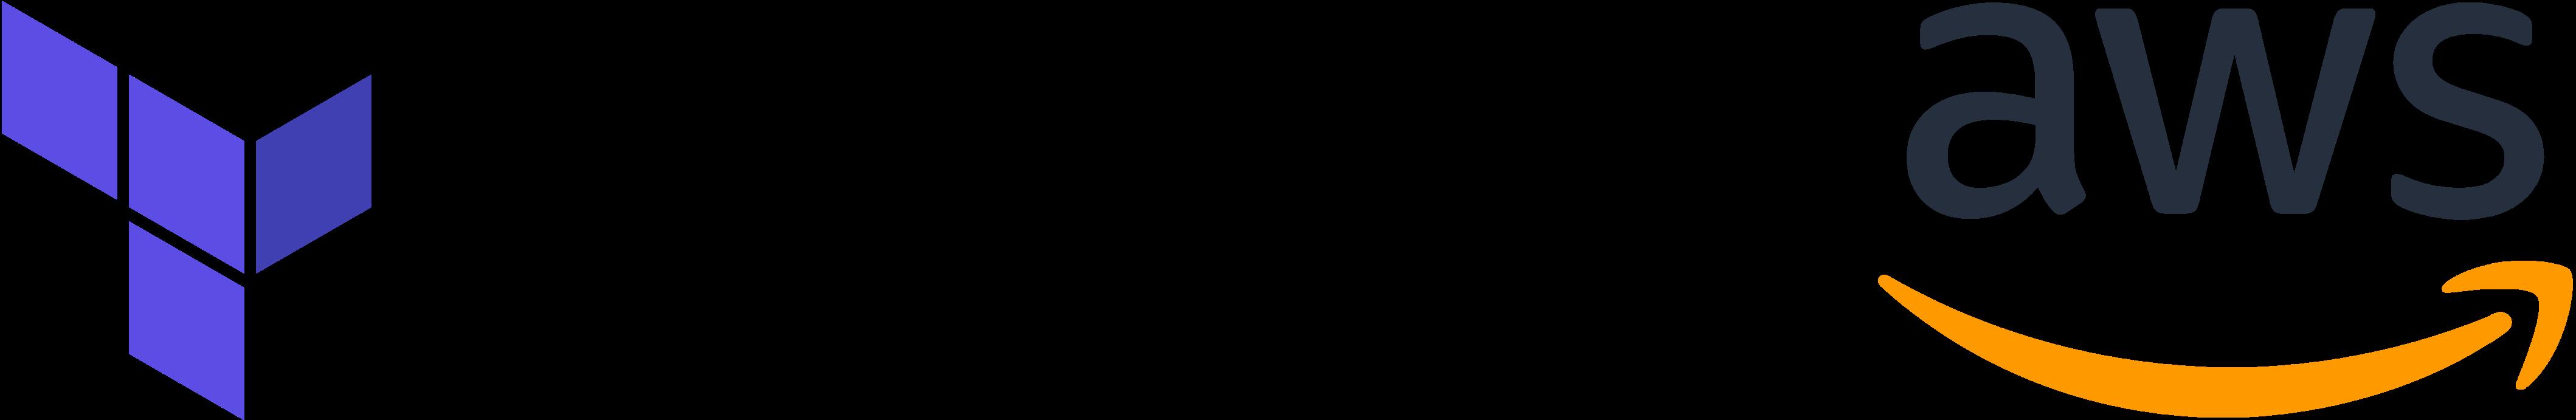 HashiCorp Terraform and AWS logos